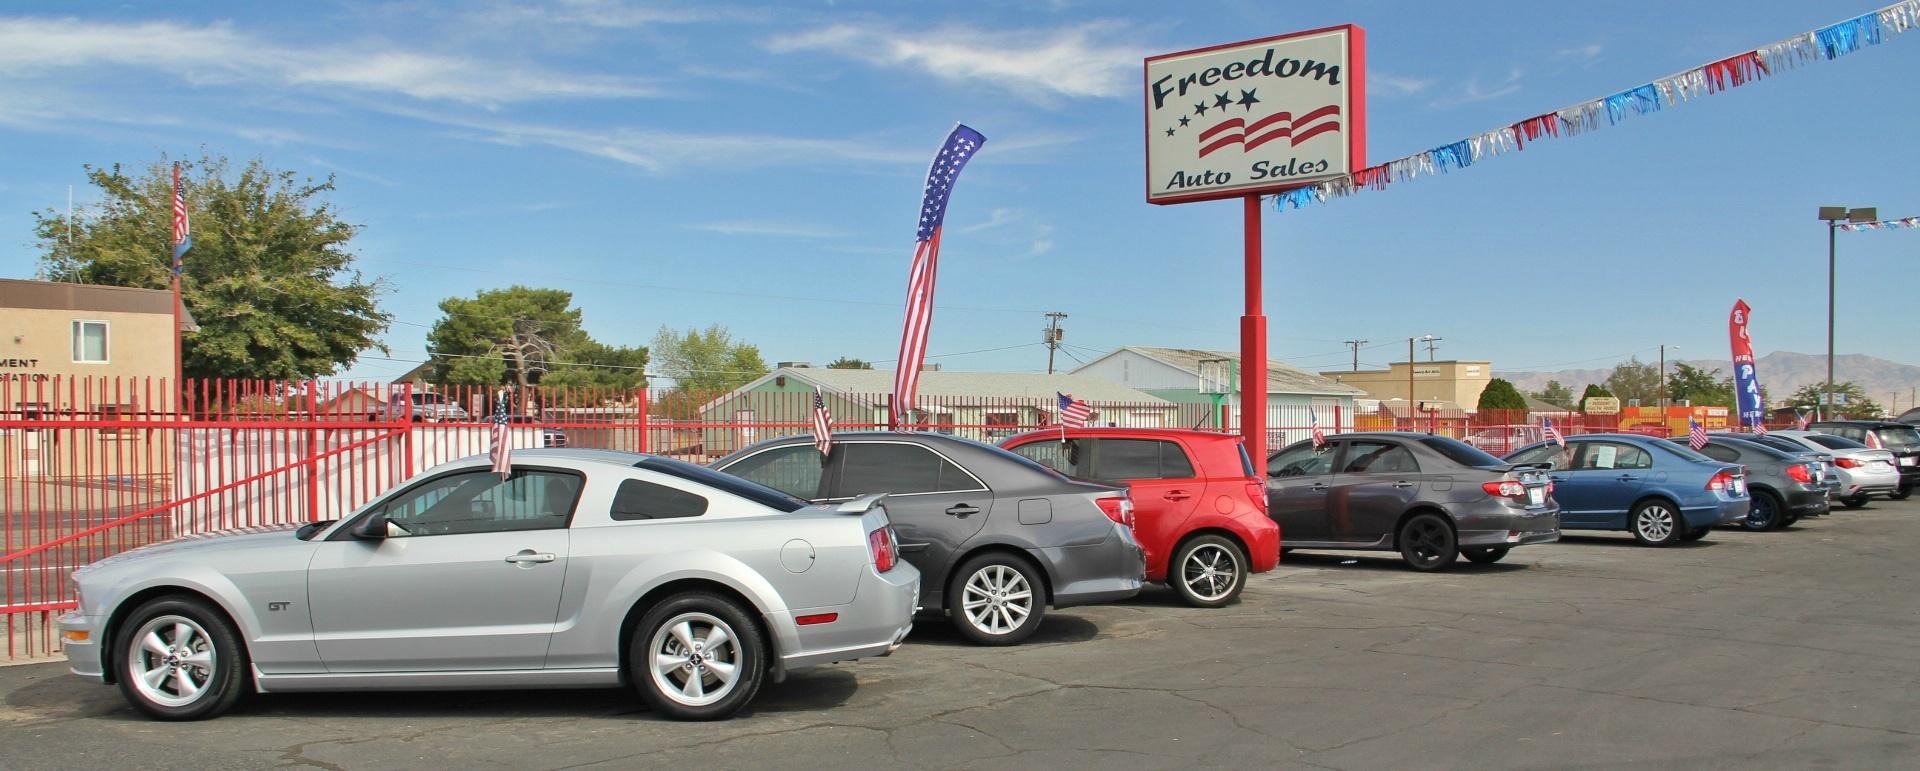 Used-Cars-For-Sale-Kingman-AZ-Auto-Dealership